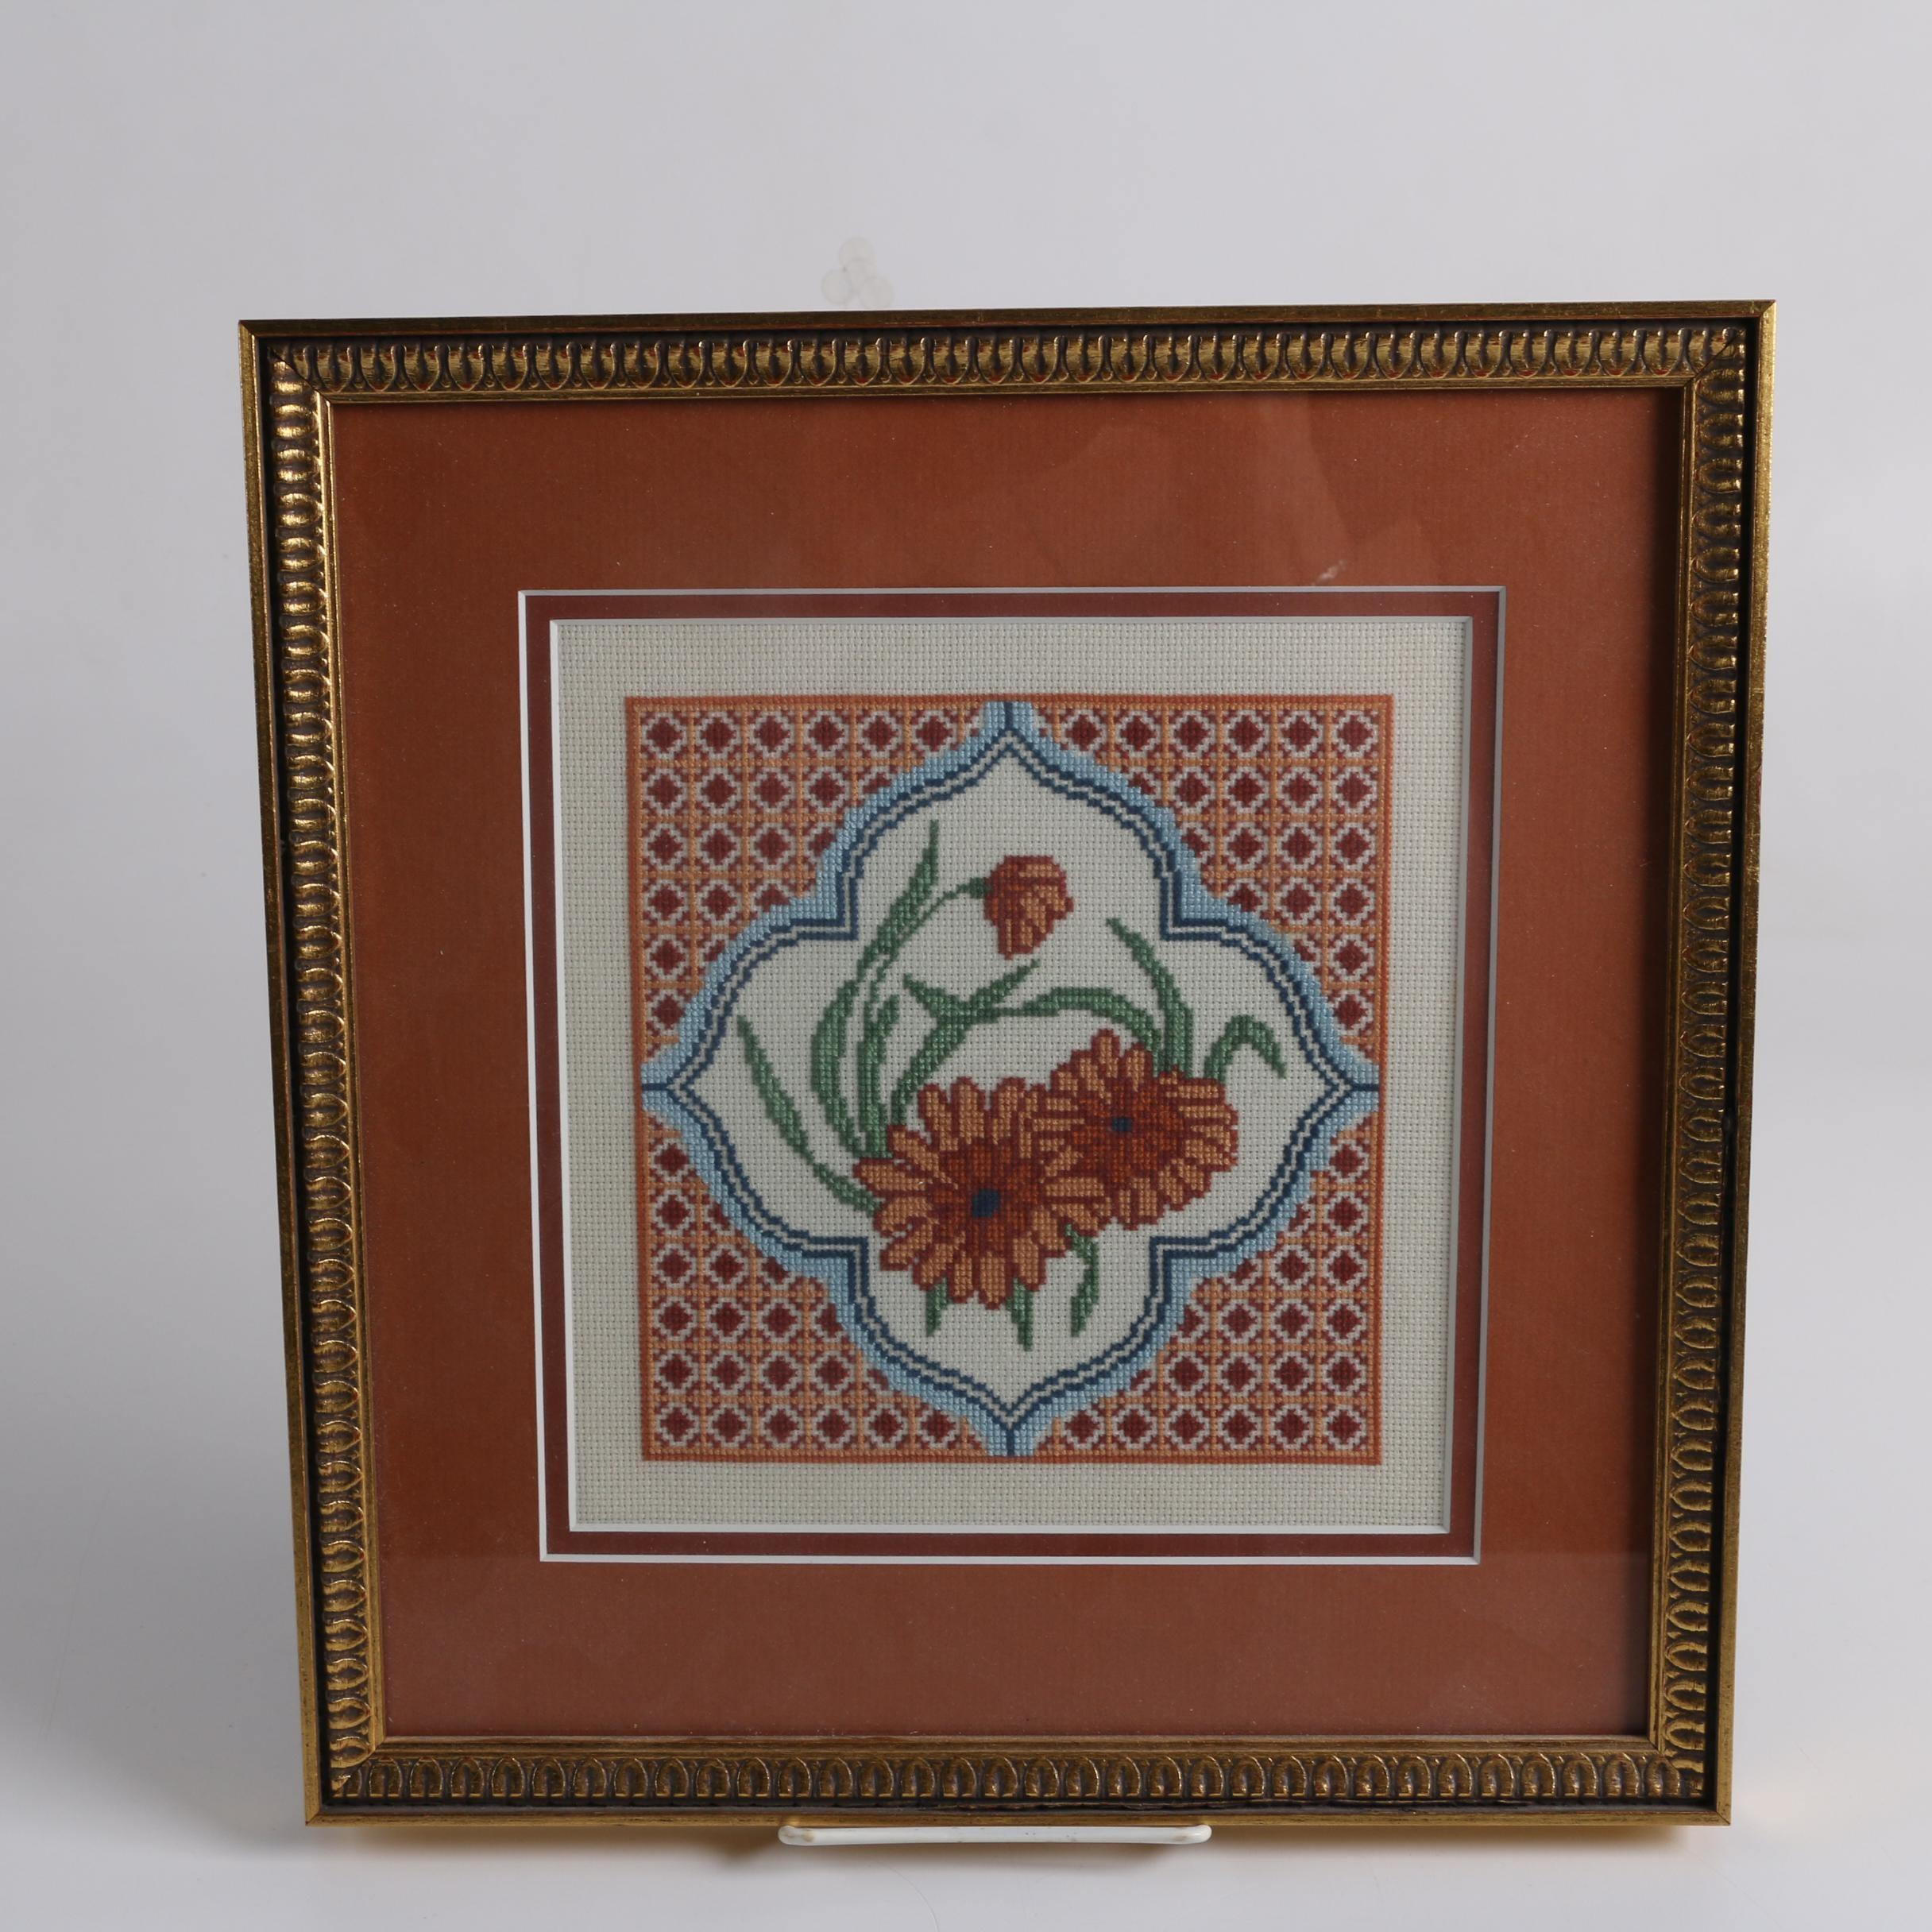 Framed Cross-Stitch of Flowers